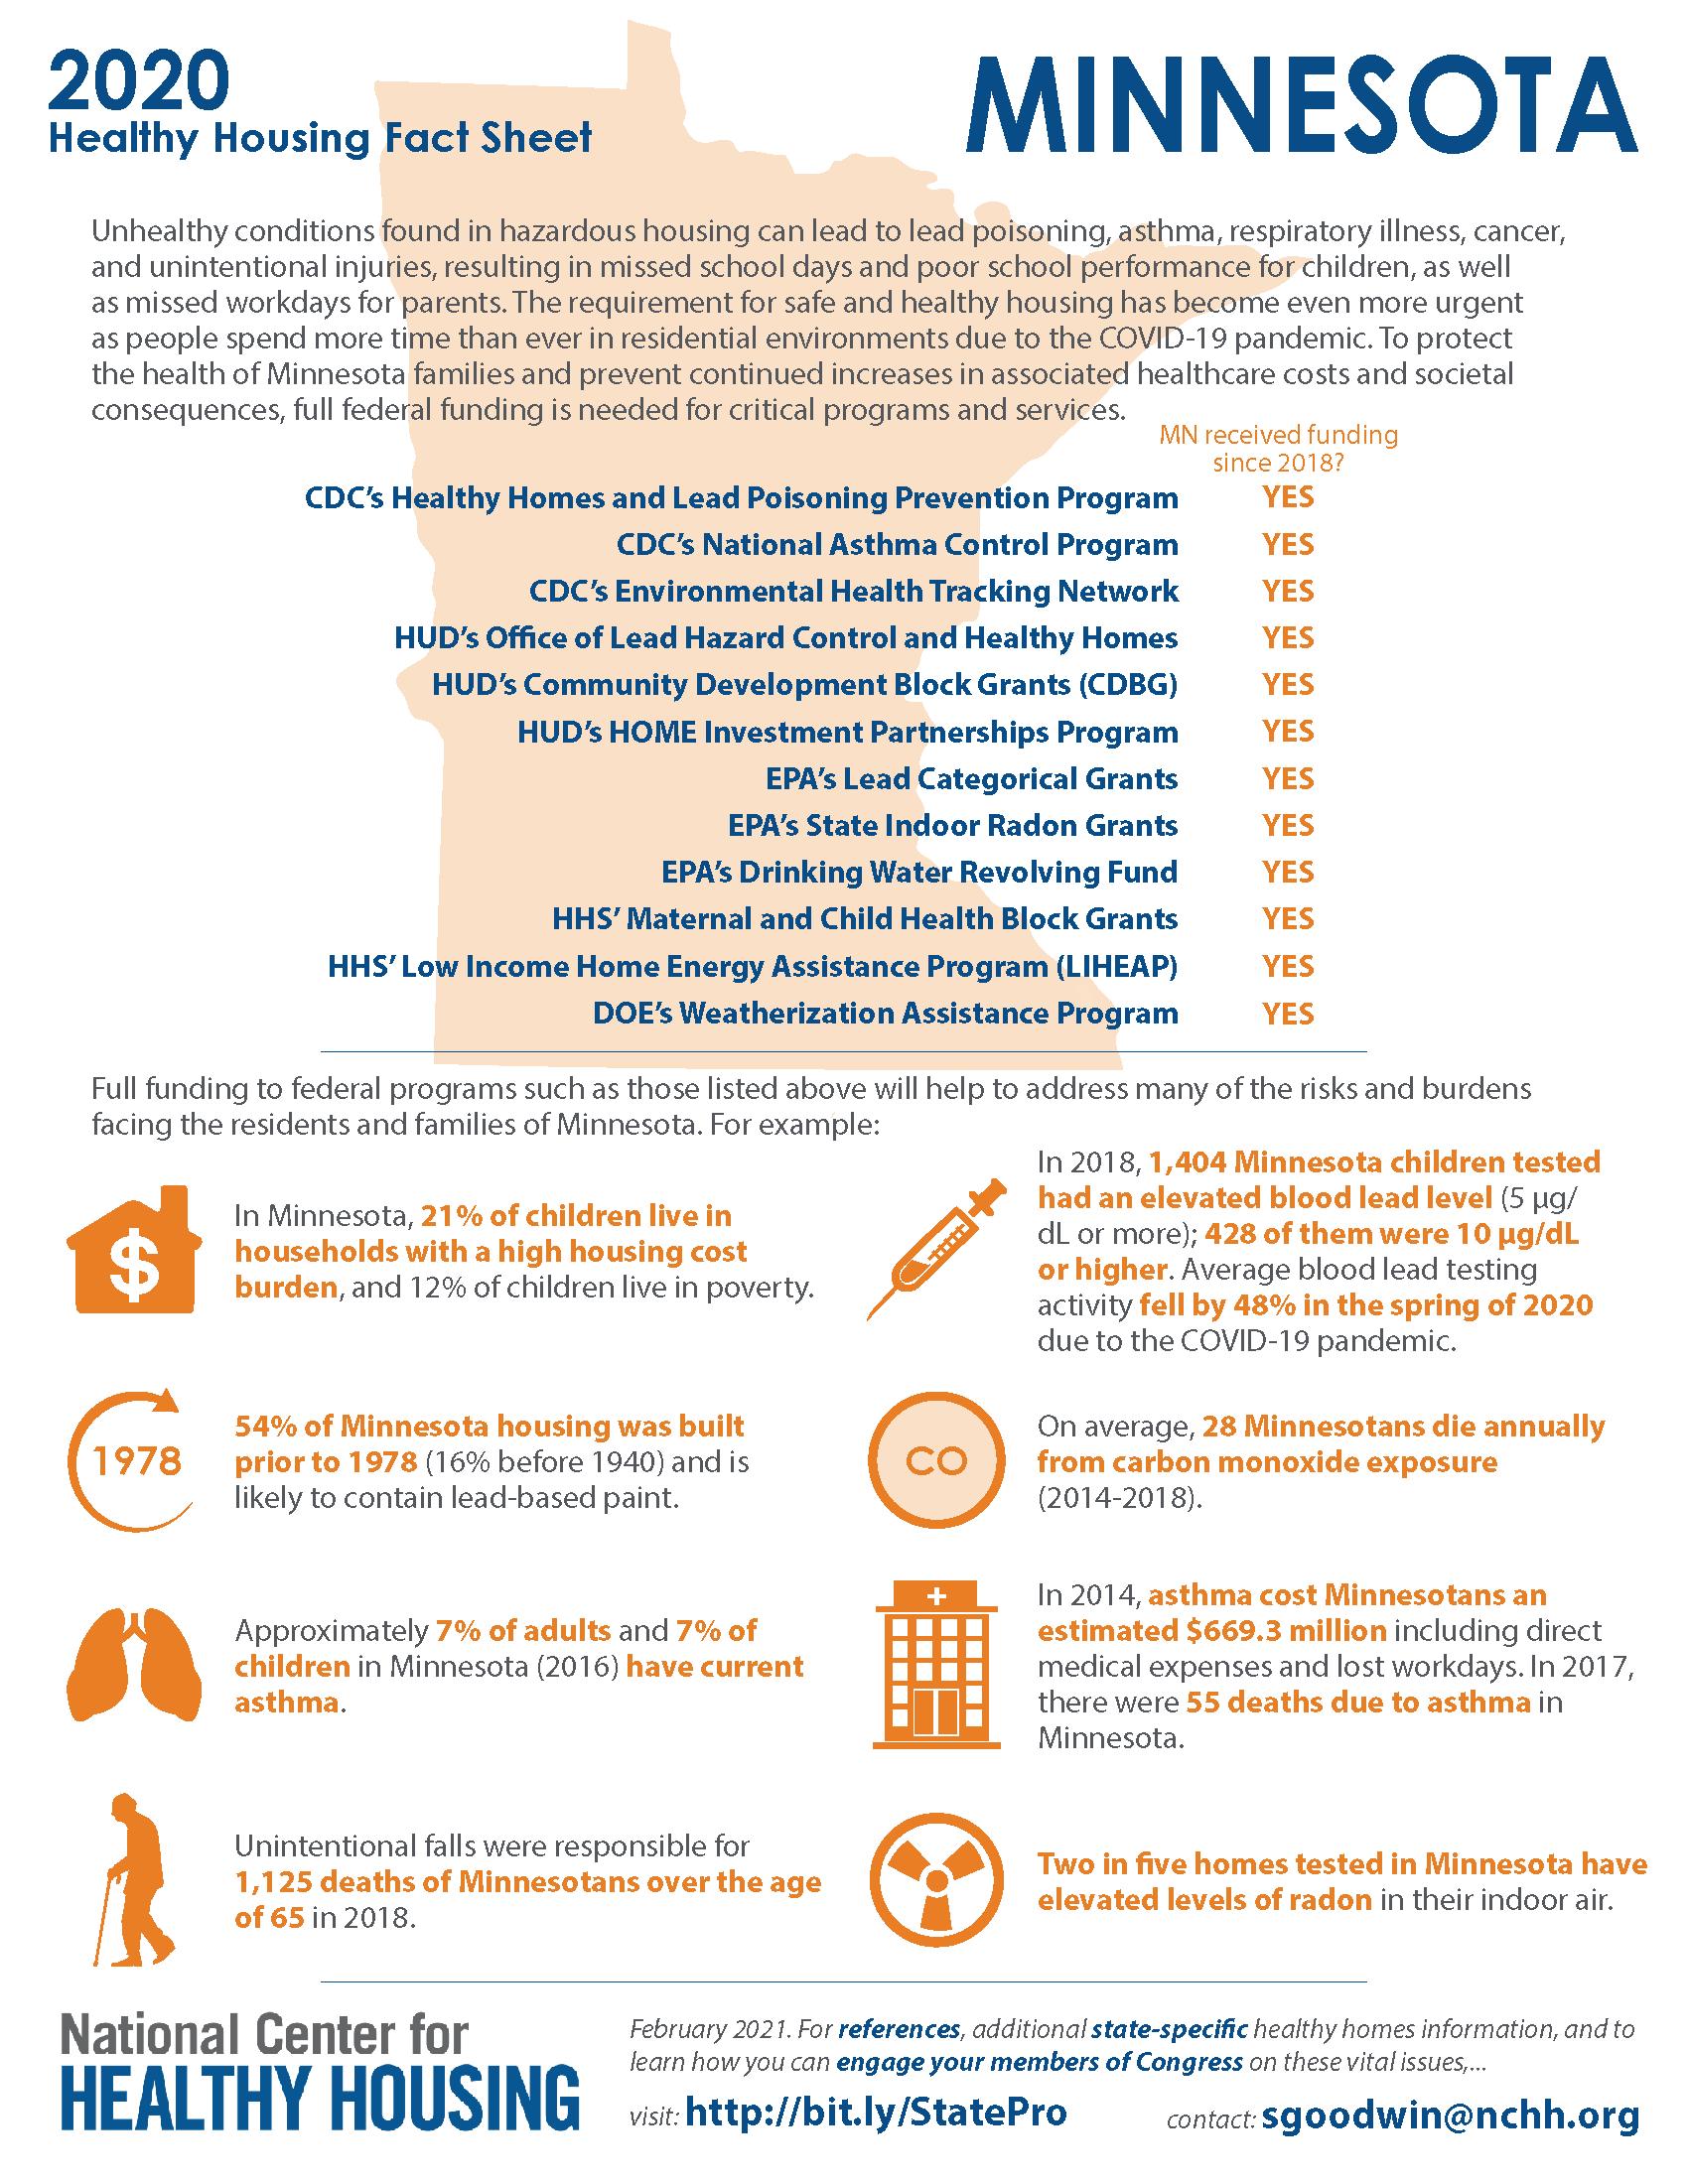 Healthy Housing Fact Sheet - Minnesota 2020